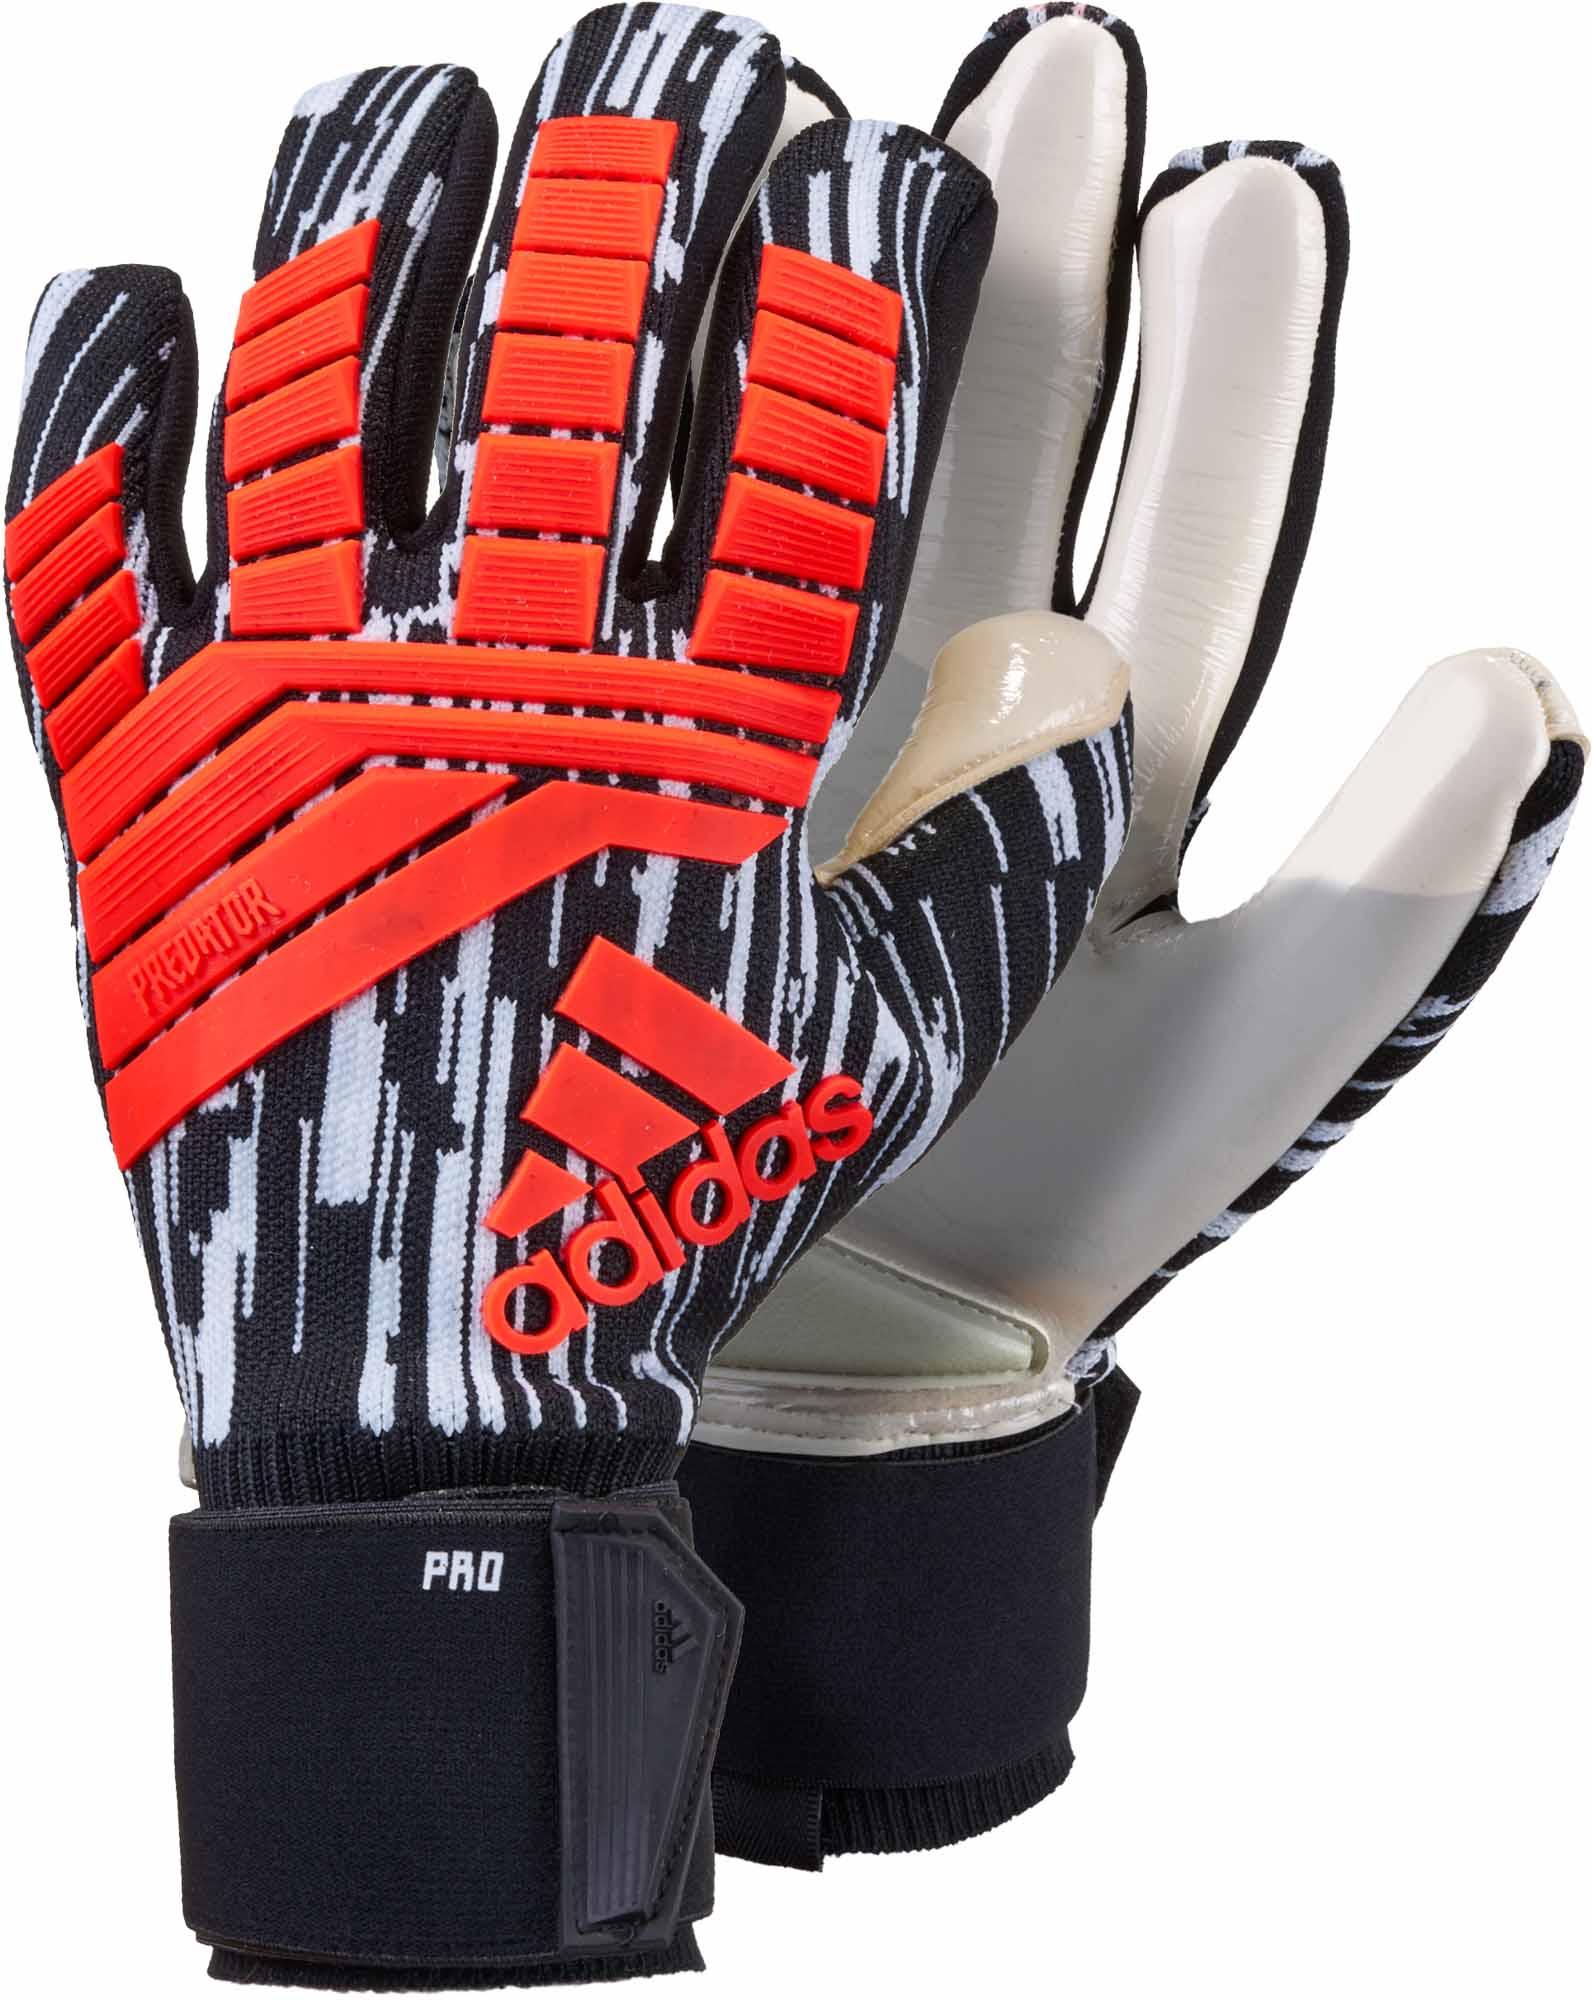 0acaf90fb adidas Predator Pro Goalkeeper Gloves – Manuel Neuer – Solar Red & Black